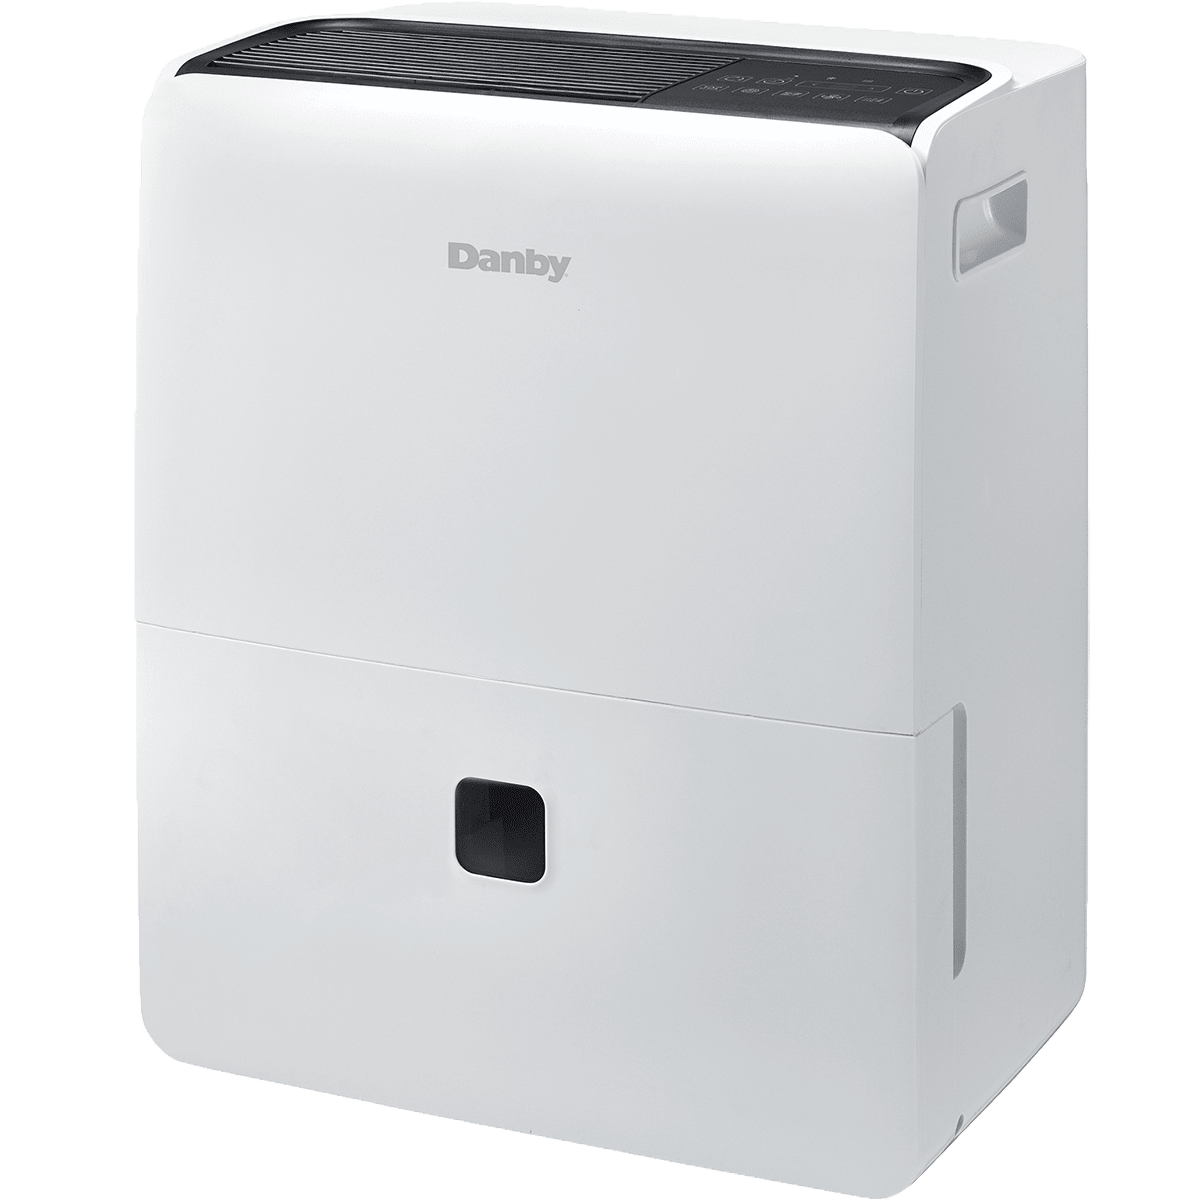 Danby 95-Pint Dehumidifier (DDR095BDPWDB)